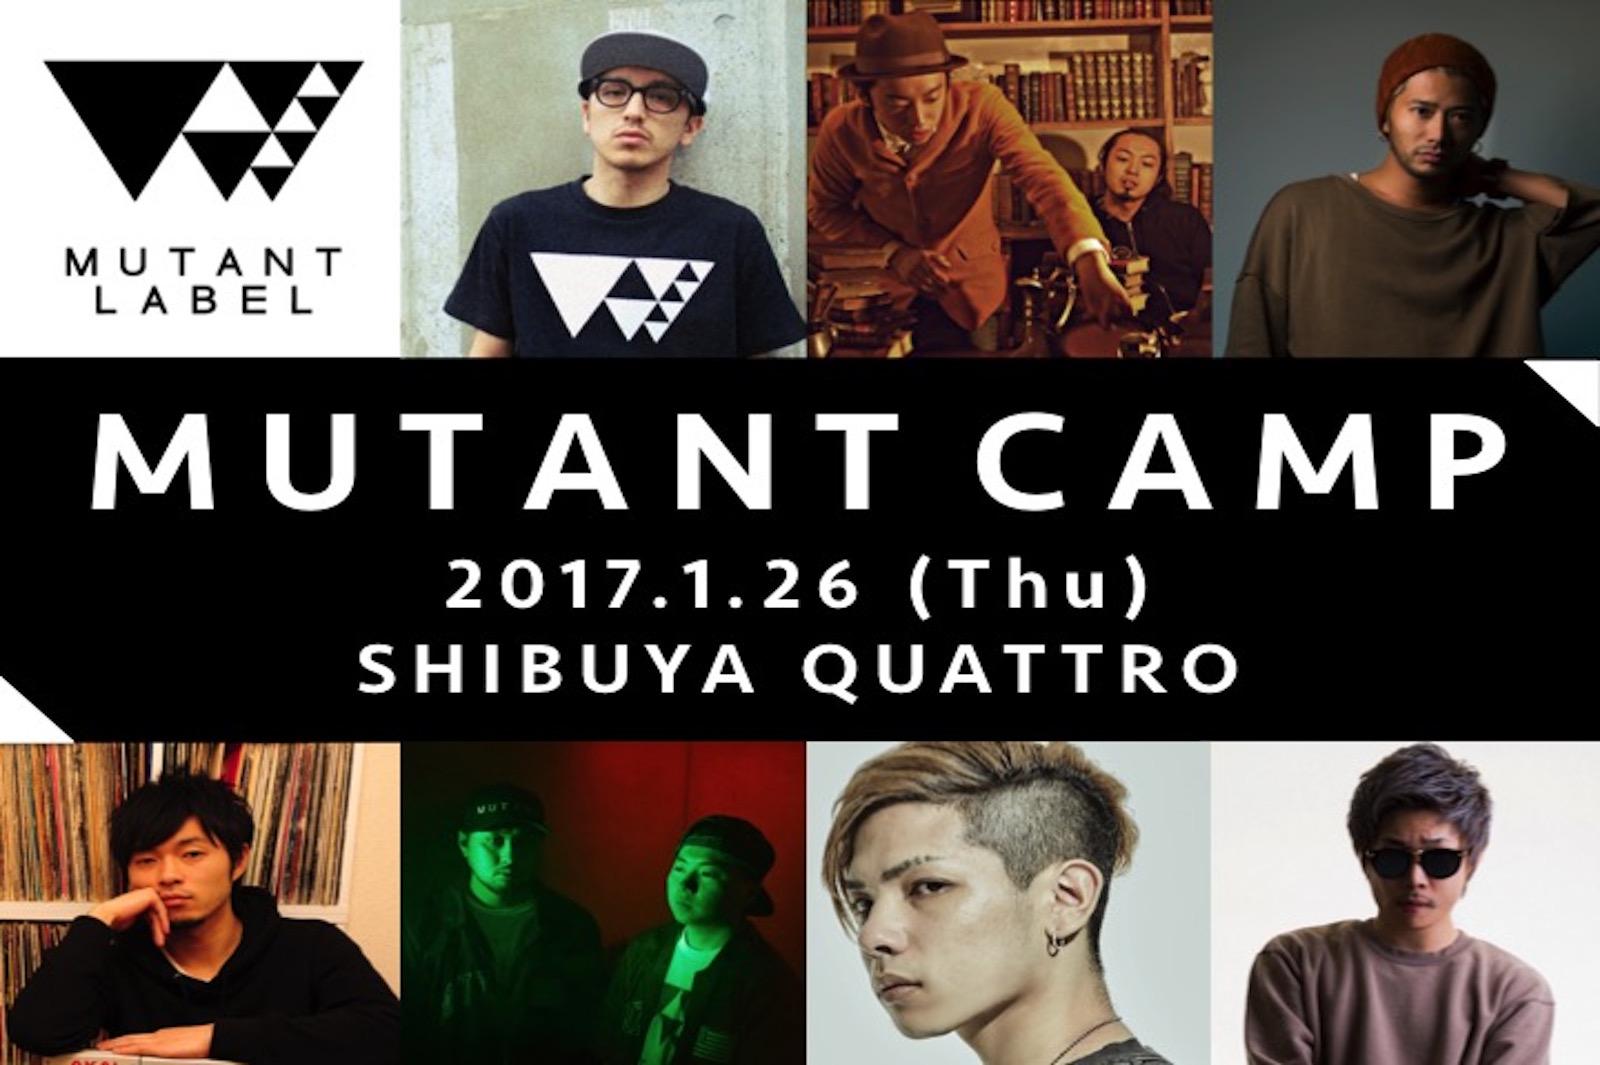 BASI(韻シスト)、Creepy Nutsら出演『MUTANT CAMP』開催